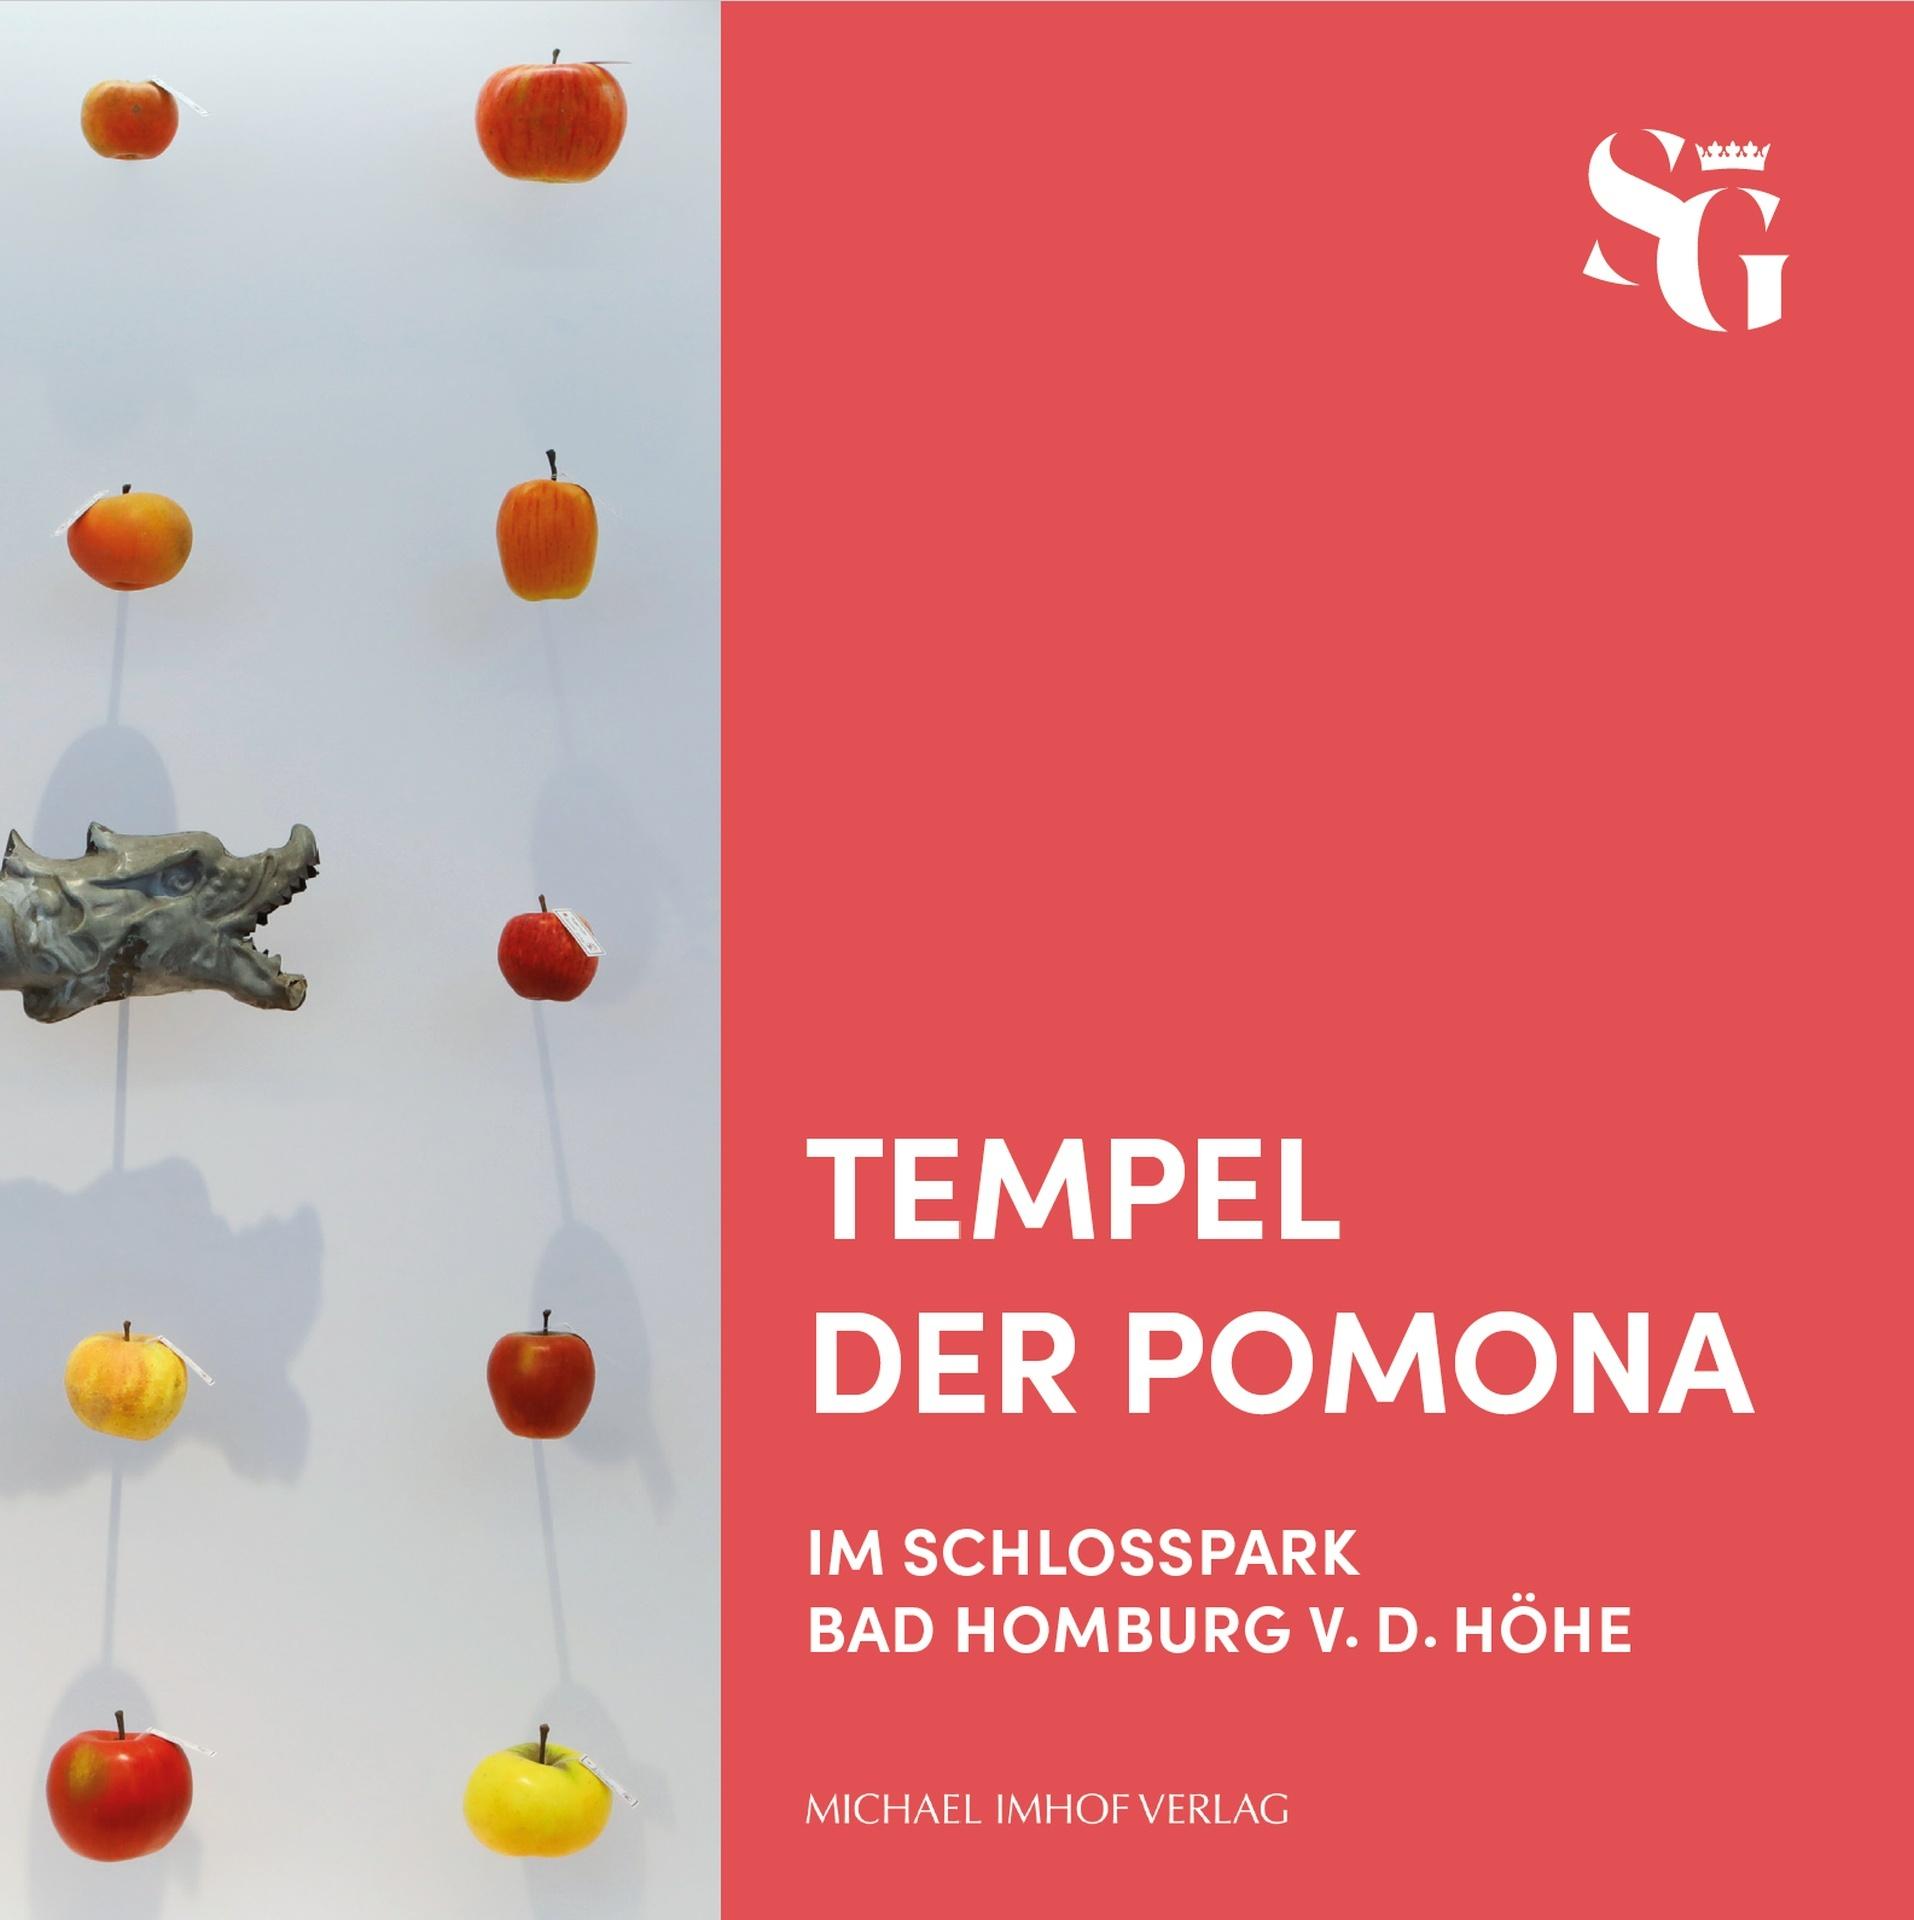 Tempel der Pomona im Schlosspark Bad Homburg